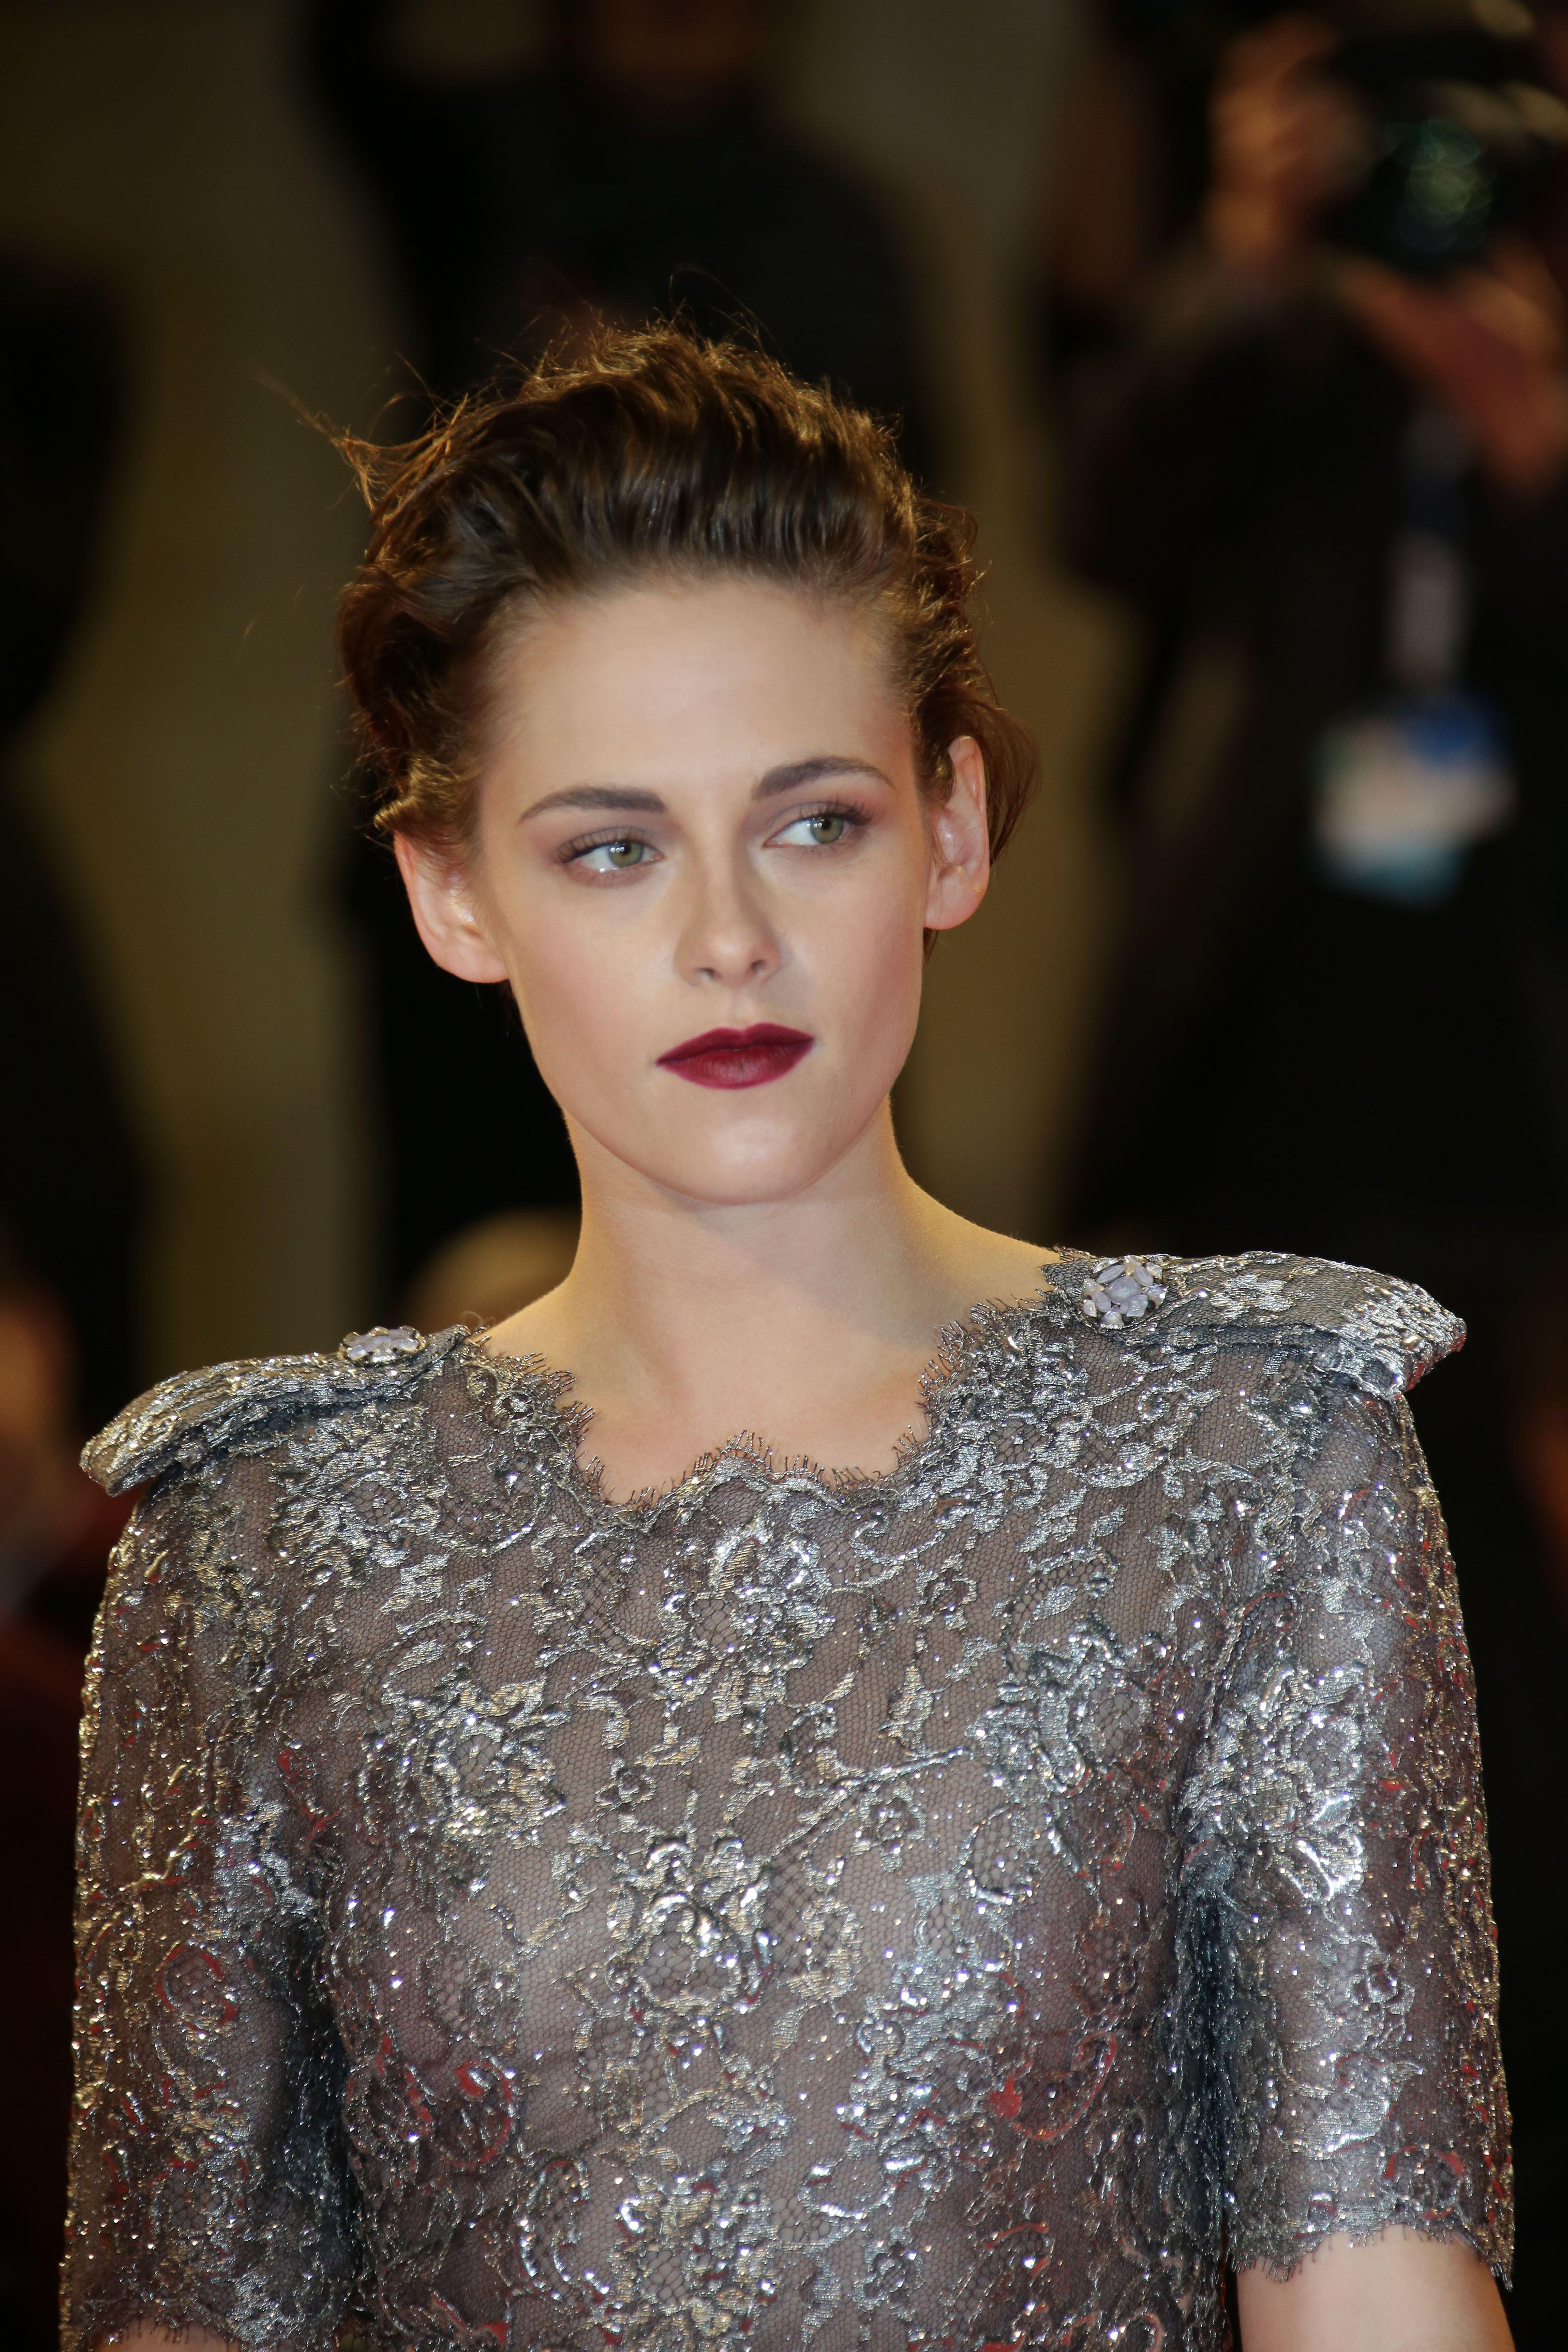 Kristen Stewart @ Eclipse LA Premiere - Actresses Photo